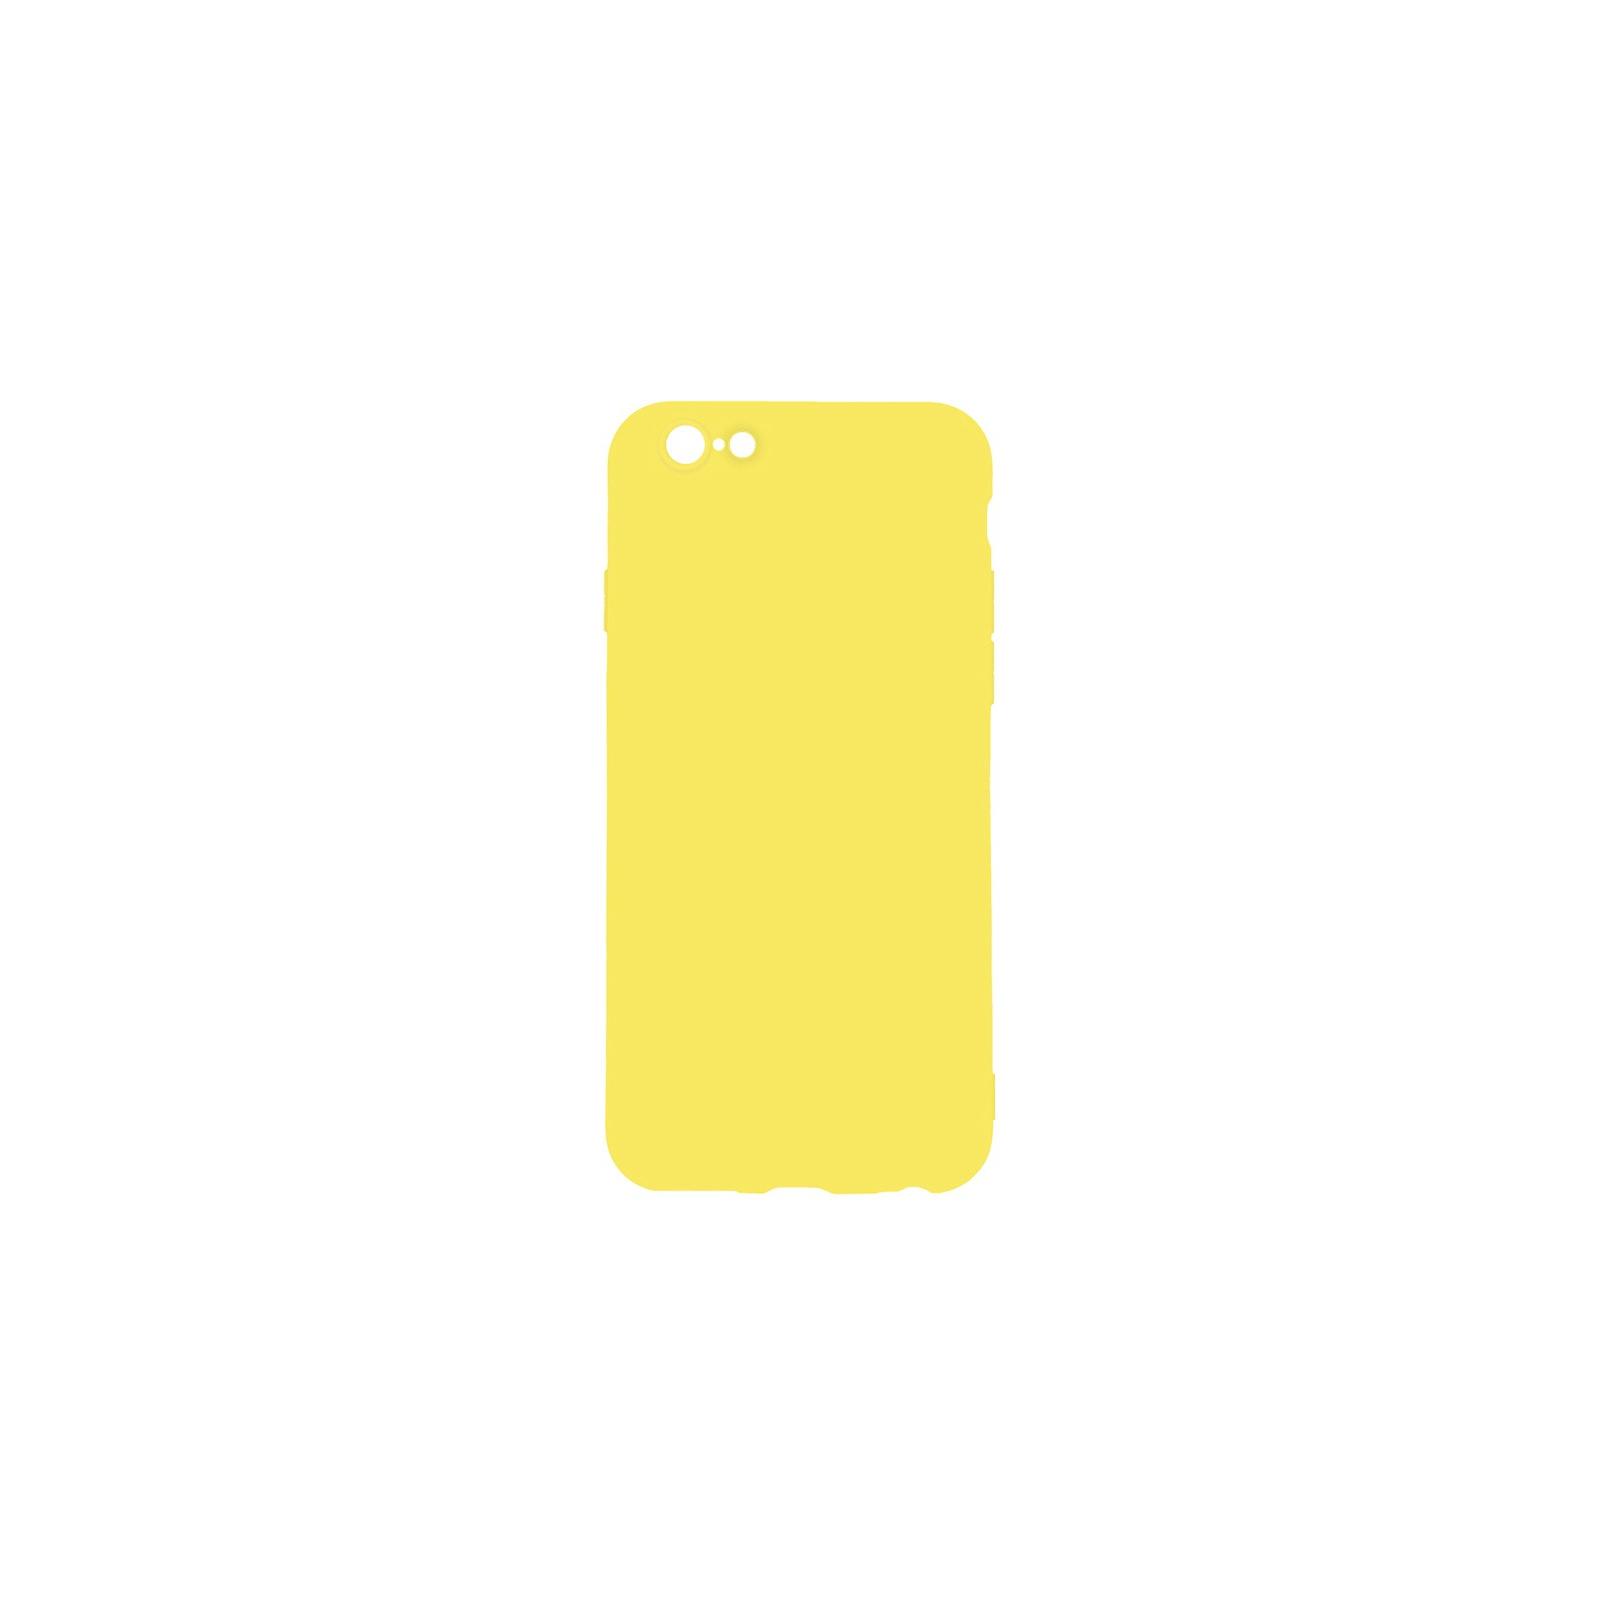 Чехол для моб. телефона Toto 1mm Matt TPU Case Apple iPhone 6 Plus/6s Plus Yellow (F_93836)